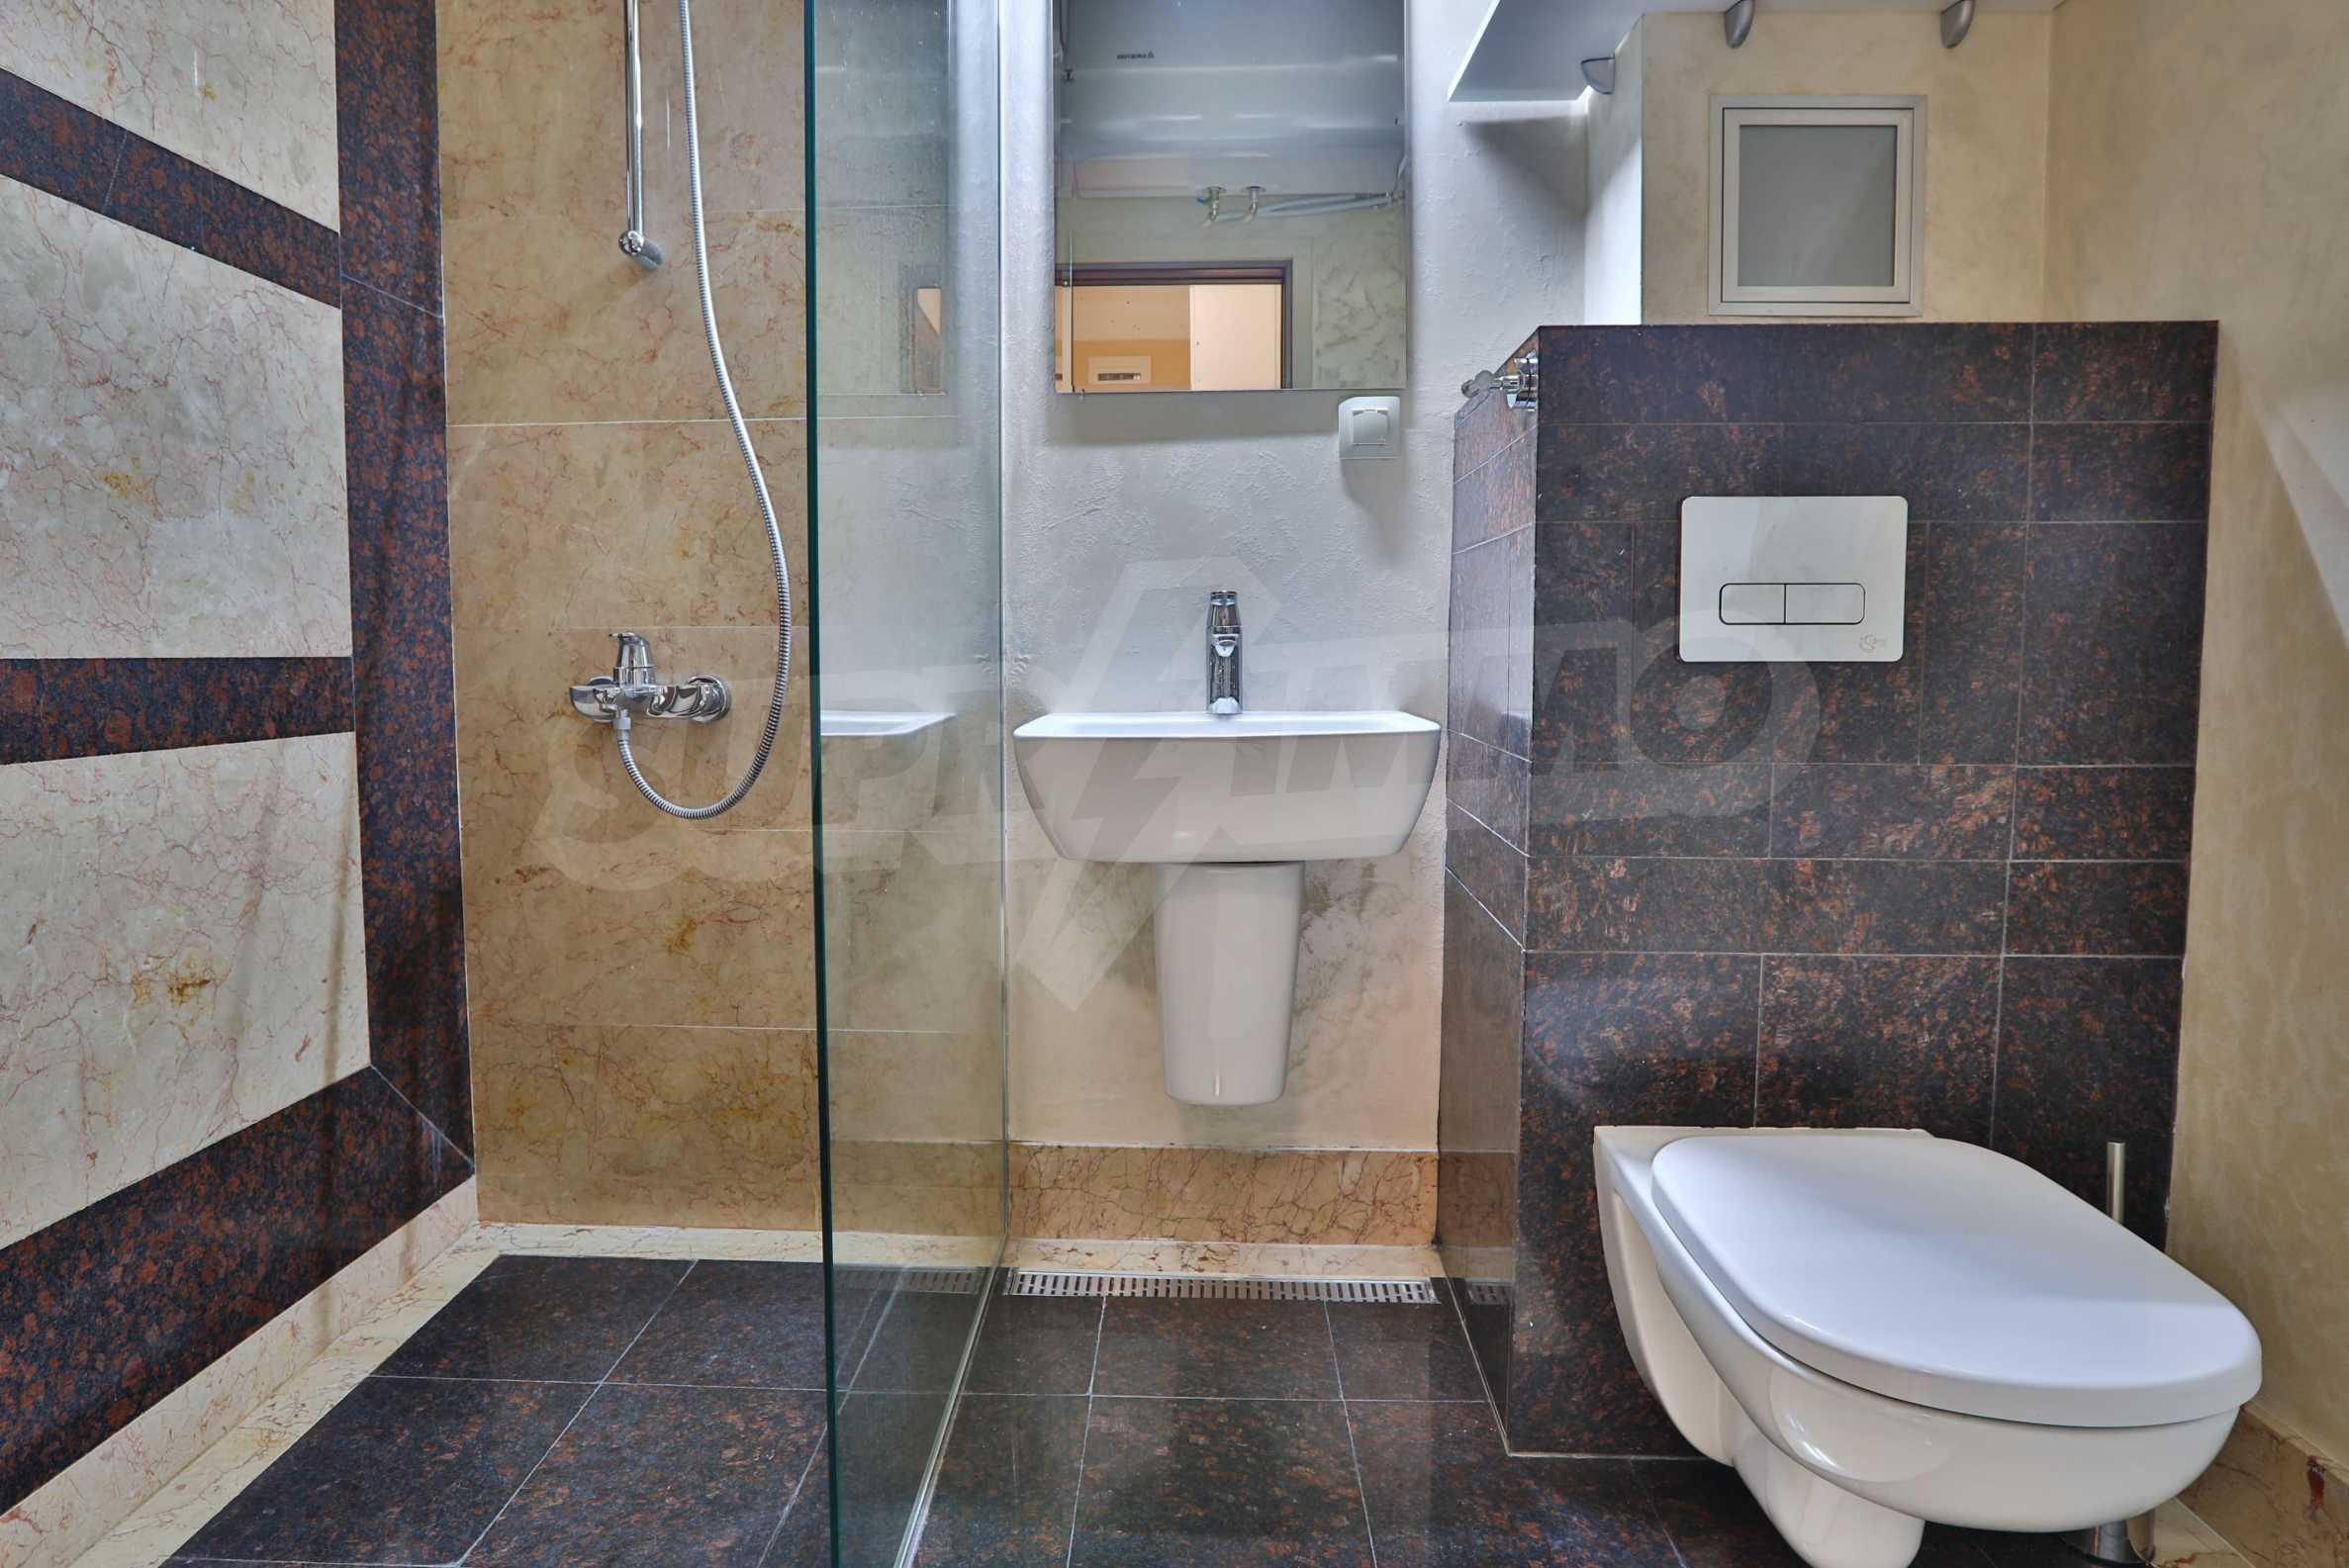 Дизайнерски тристаен апартамент под наем за летен сезон в резиденция Belle Époque в Лозенец 23